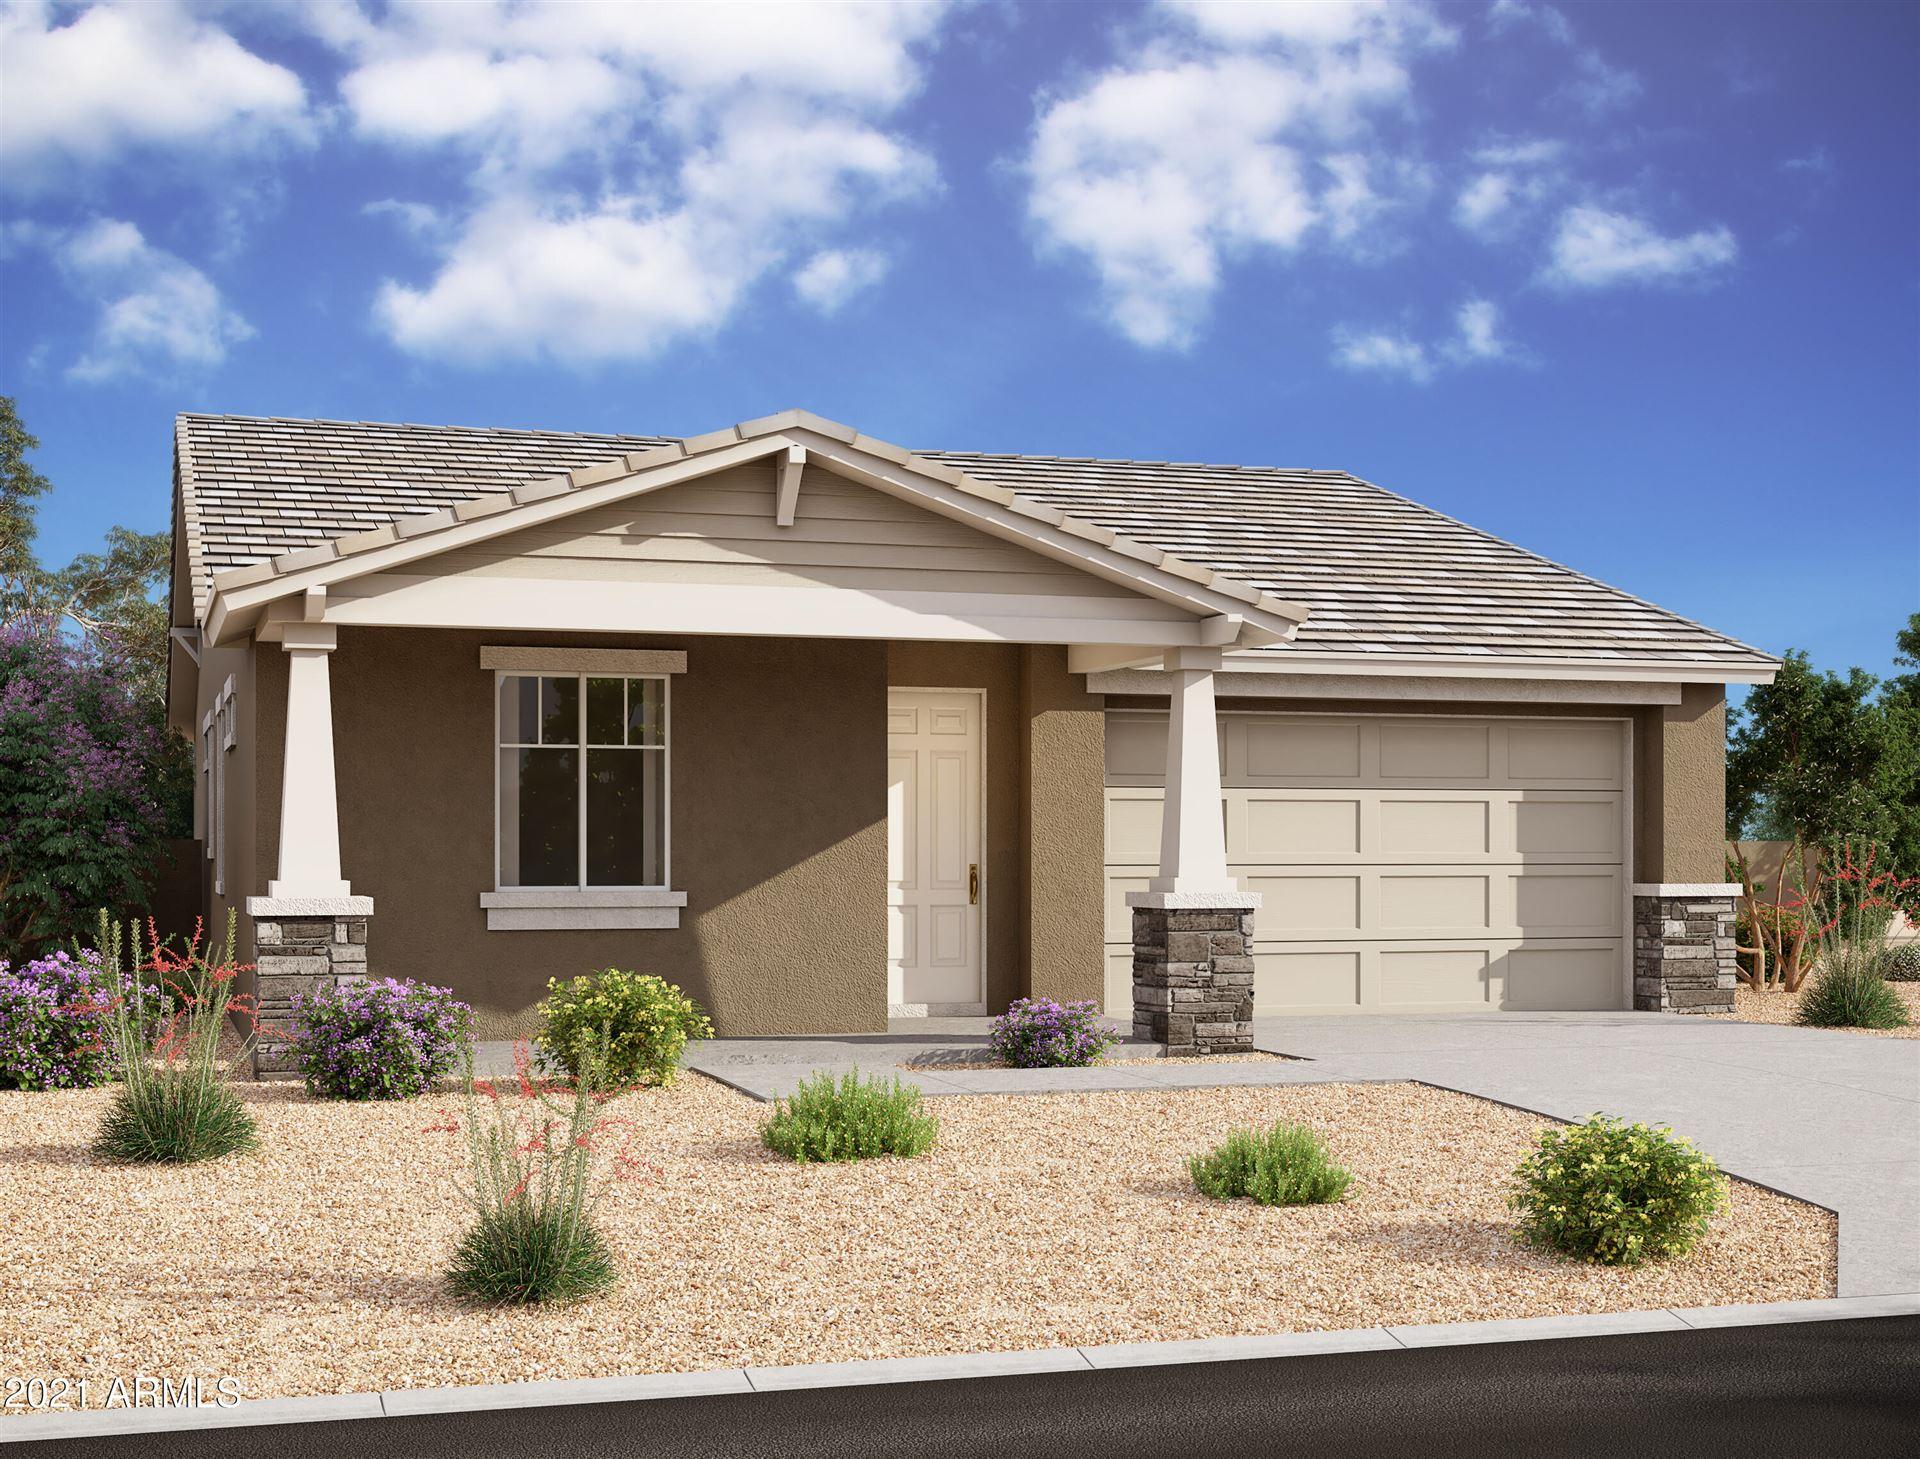 Photo of 5618 W WESTERN STAR Boulevard, Laveen, AZ 85339 (MLS # 6290684)